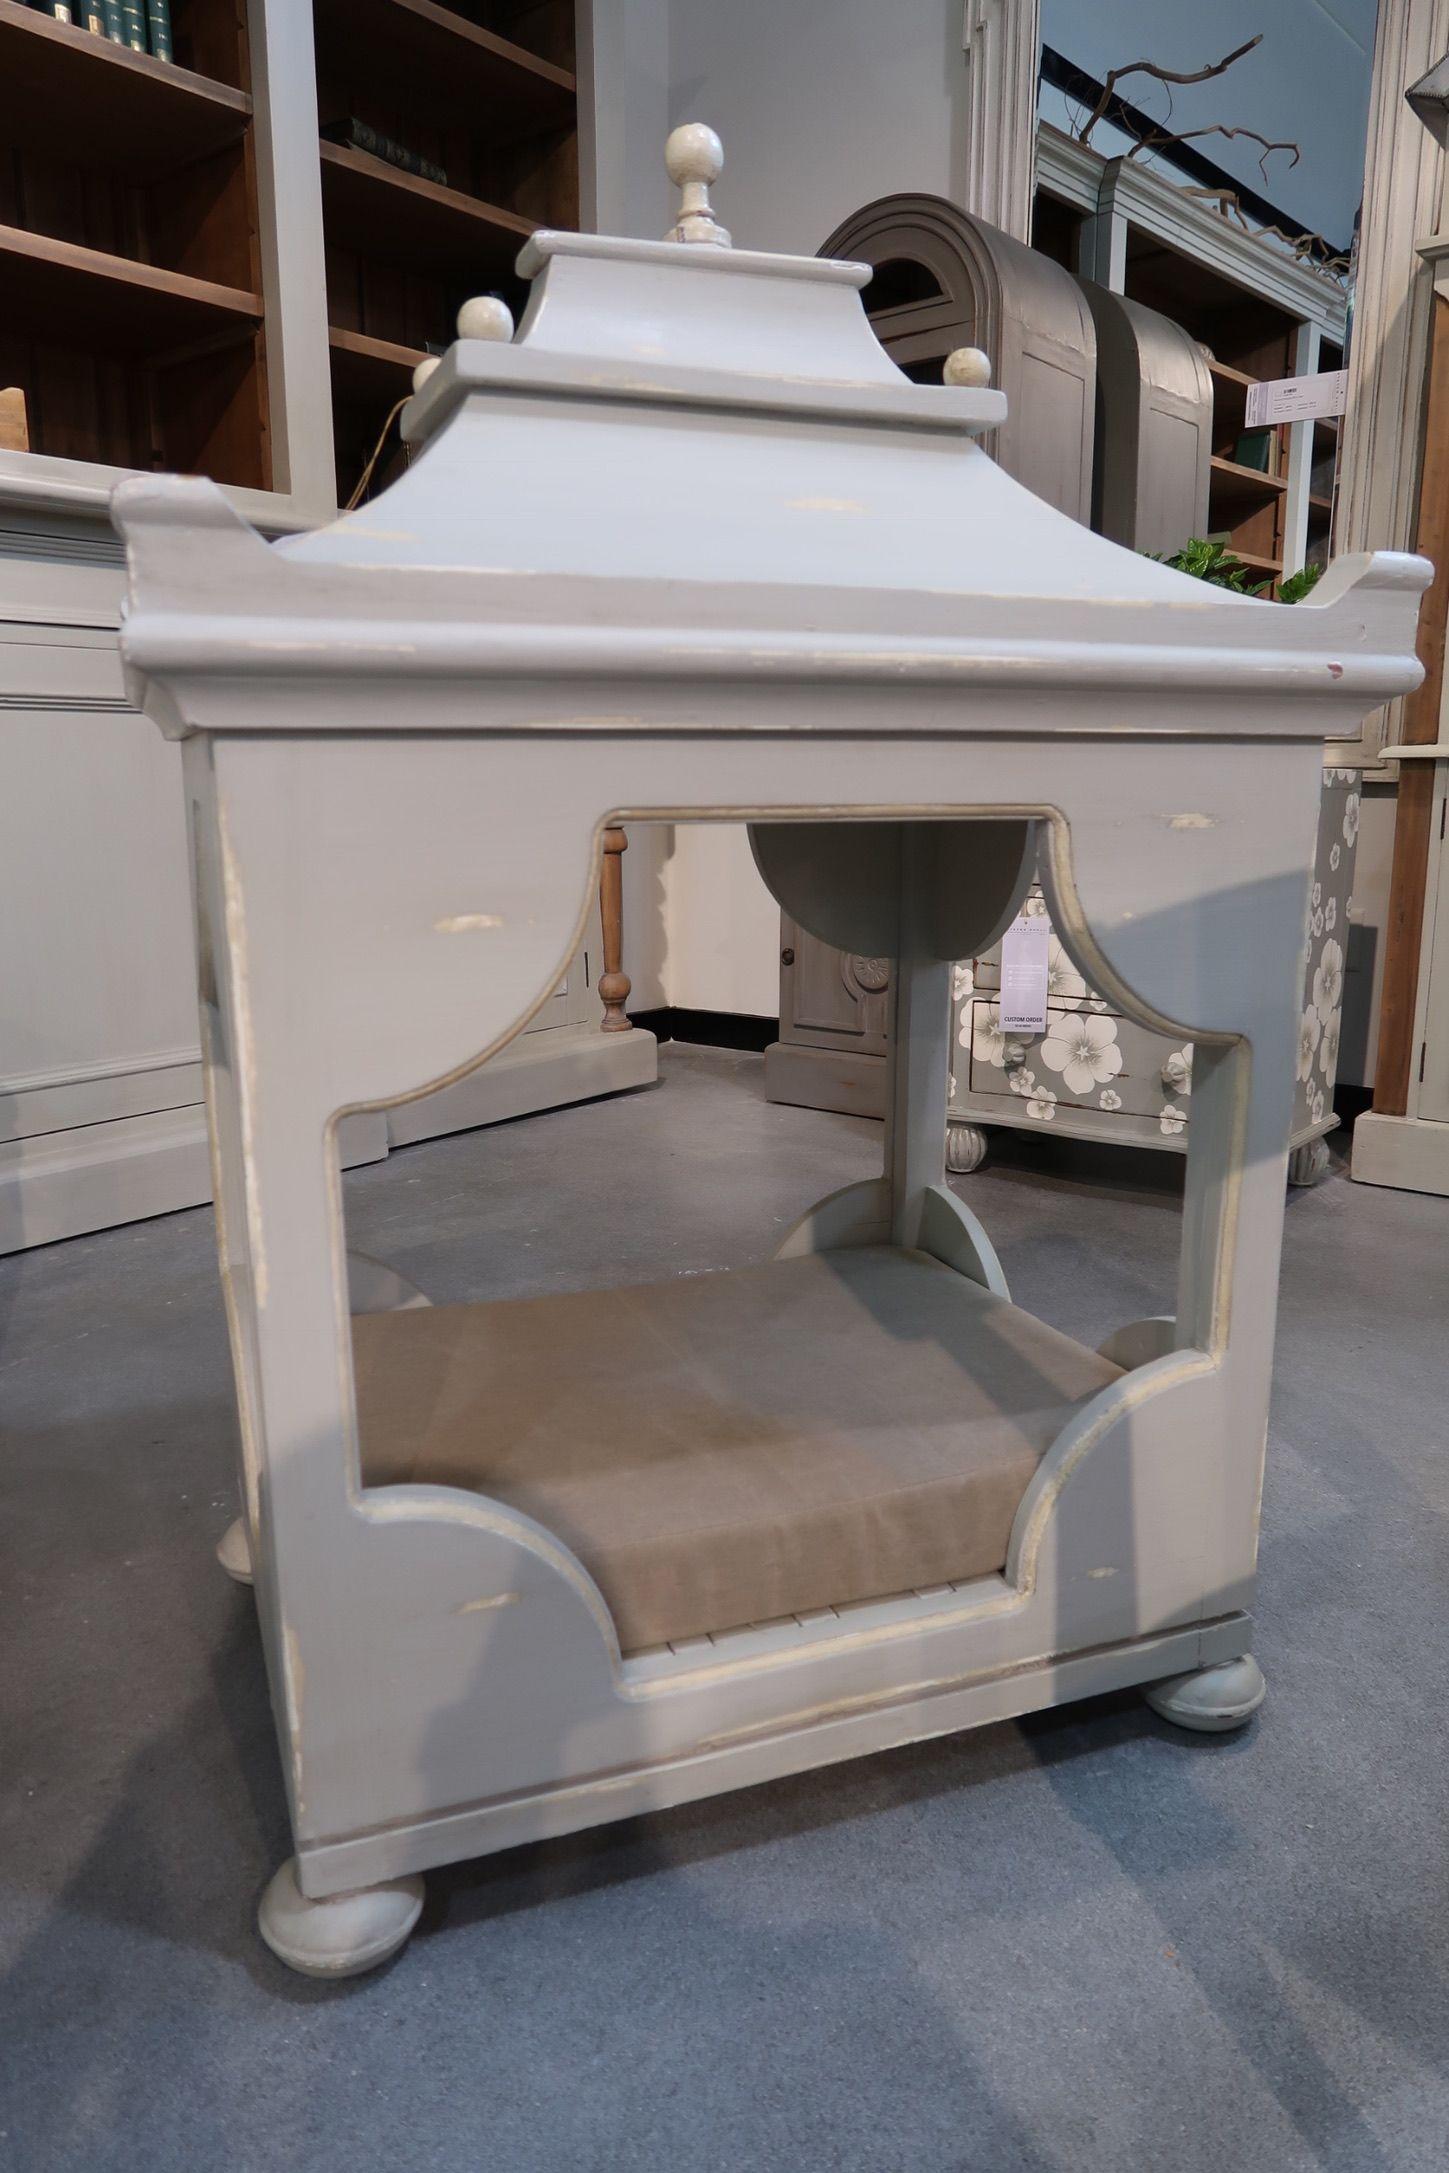 designer dog bed in gray at steven shell   high point  - designer dog bed in gray at steven shell